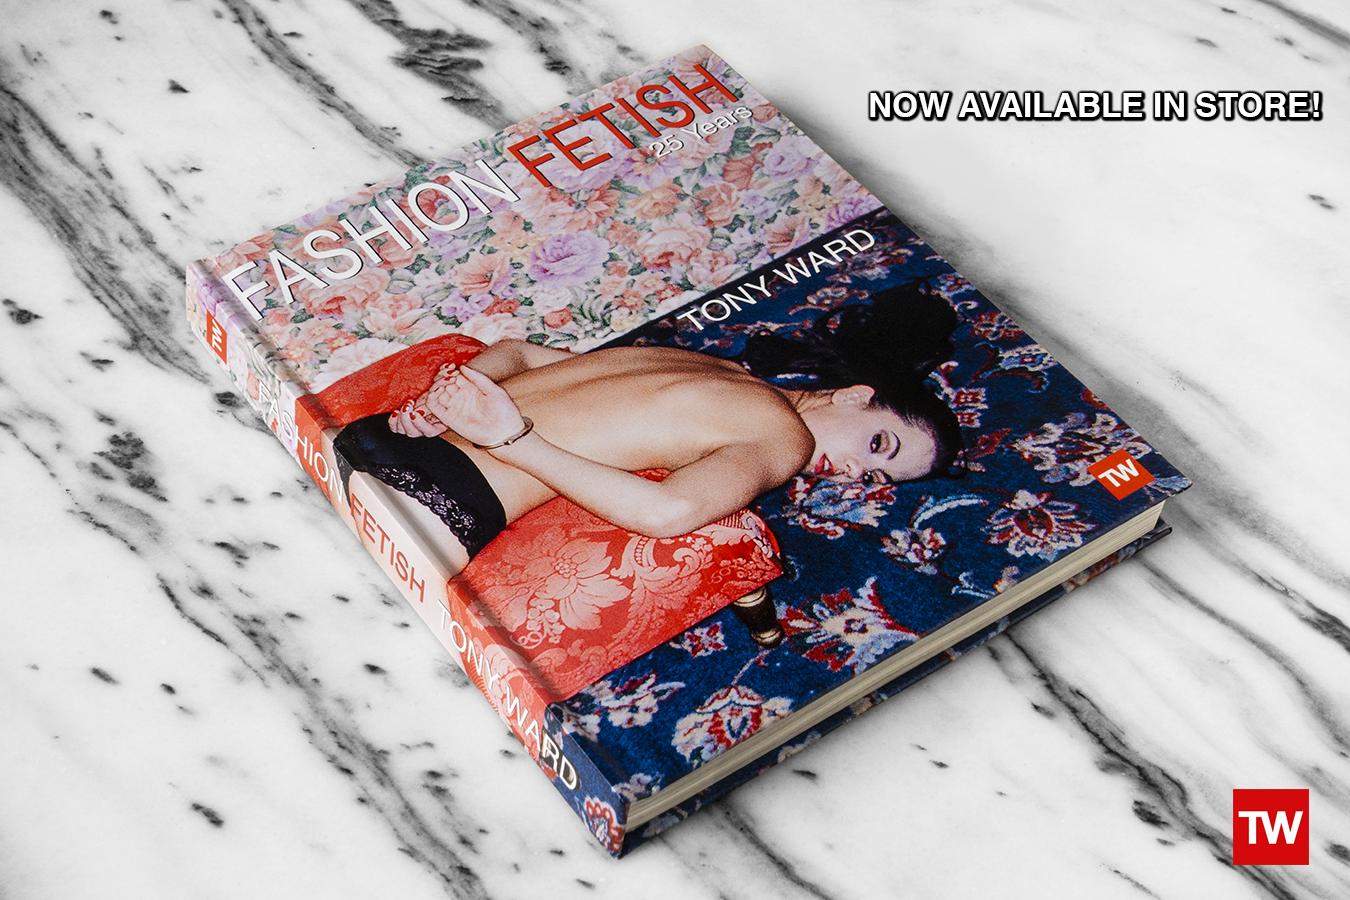 fashion_fetish_25_years_limited_edition_tony_ward